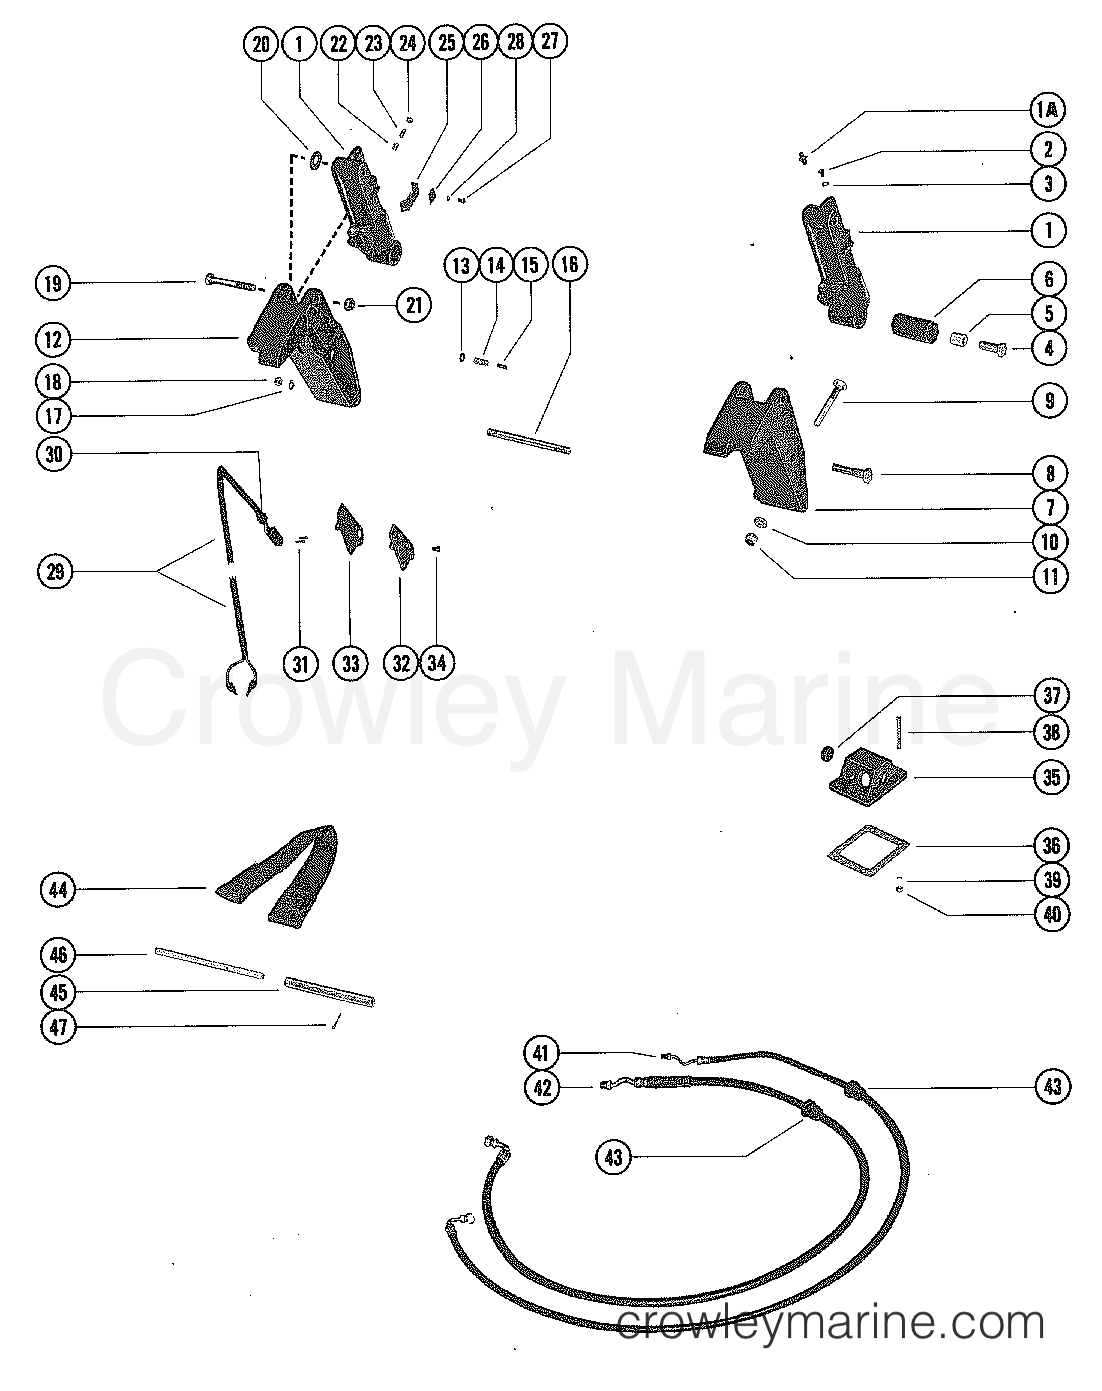 Diagram Of 1978 Mercury Marine Mercury Outboard 1090528 Power Trim